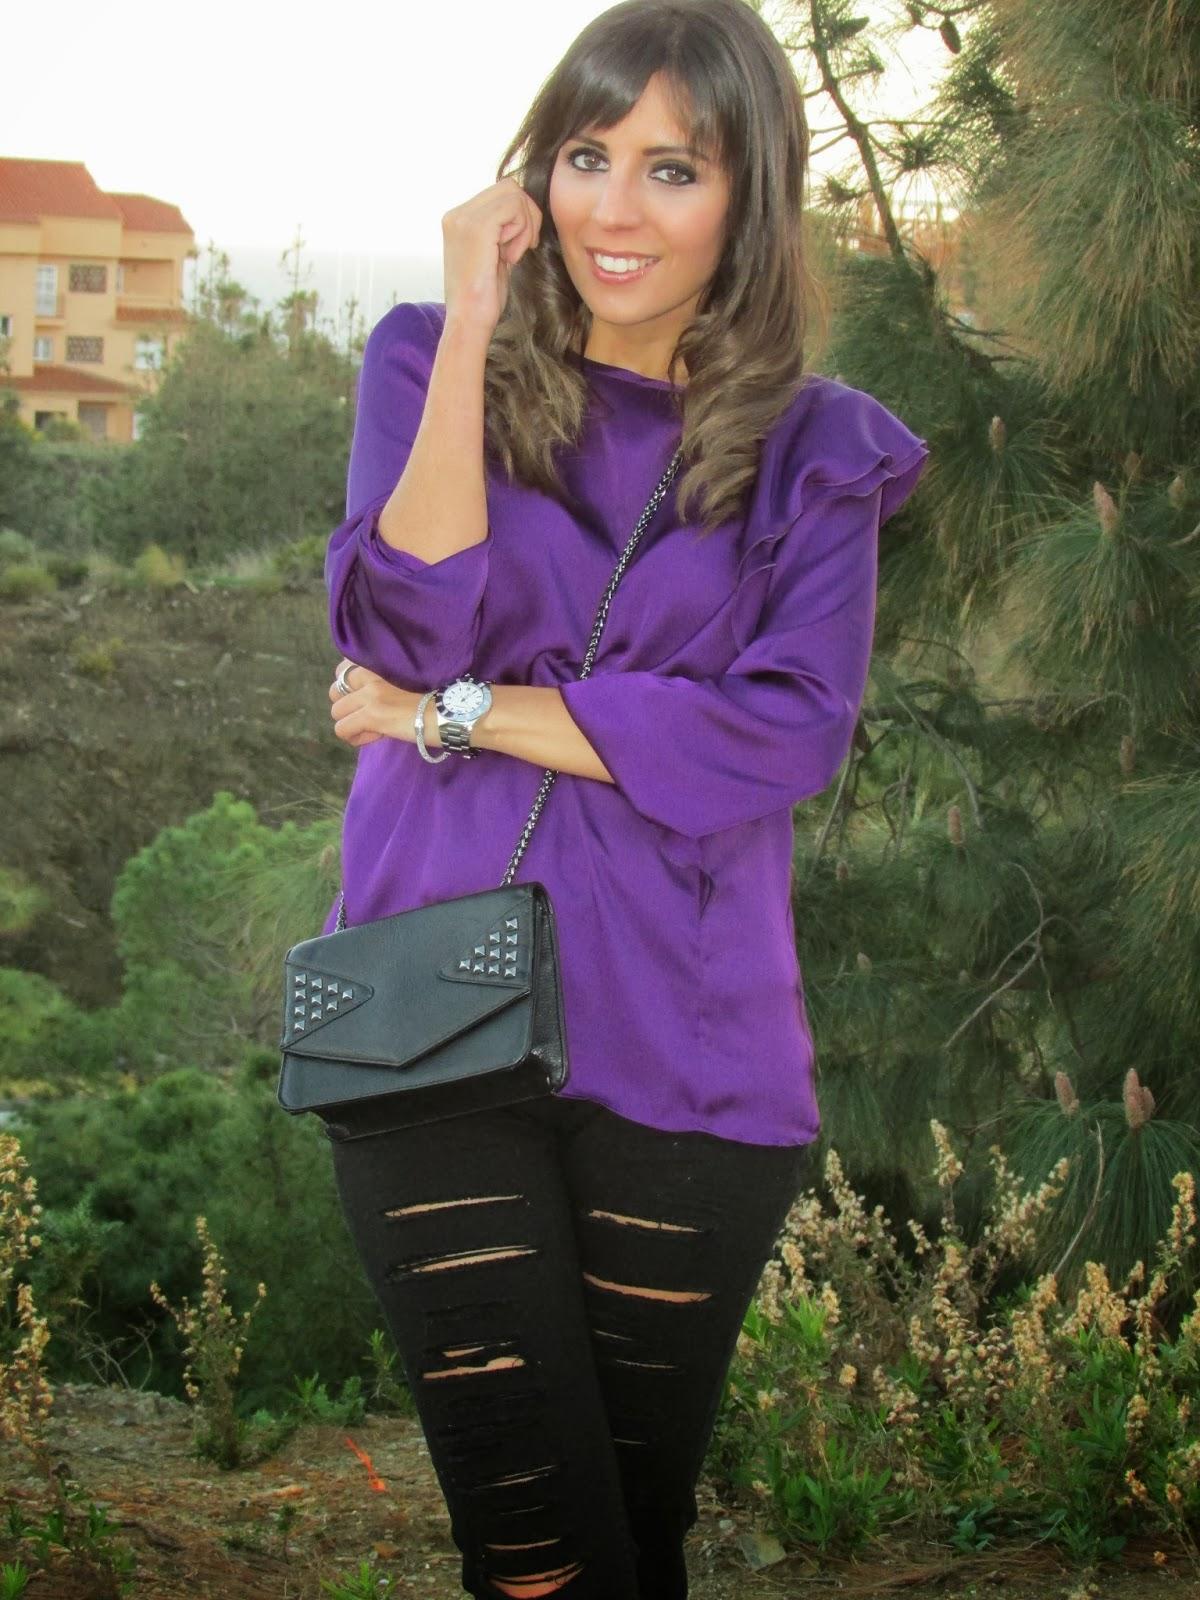 street style fashion blogger cristina style blog moda tendencias ootd outfit look teen vogue malaga malagueña